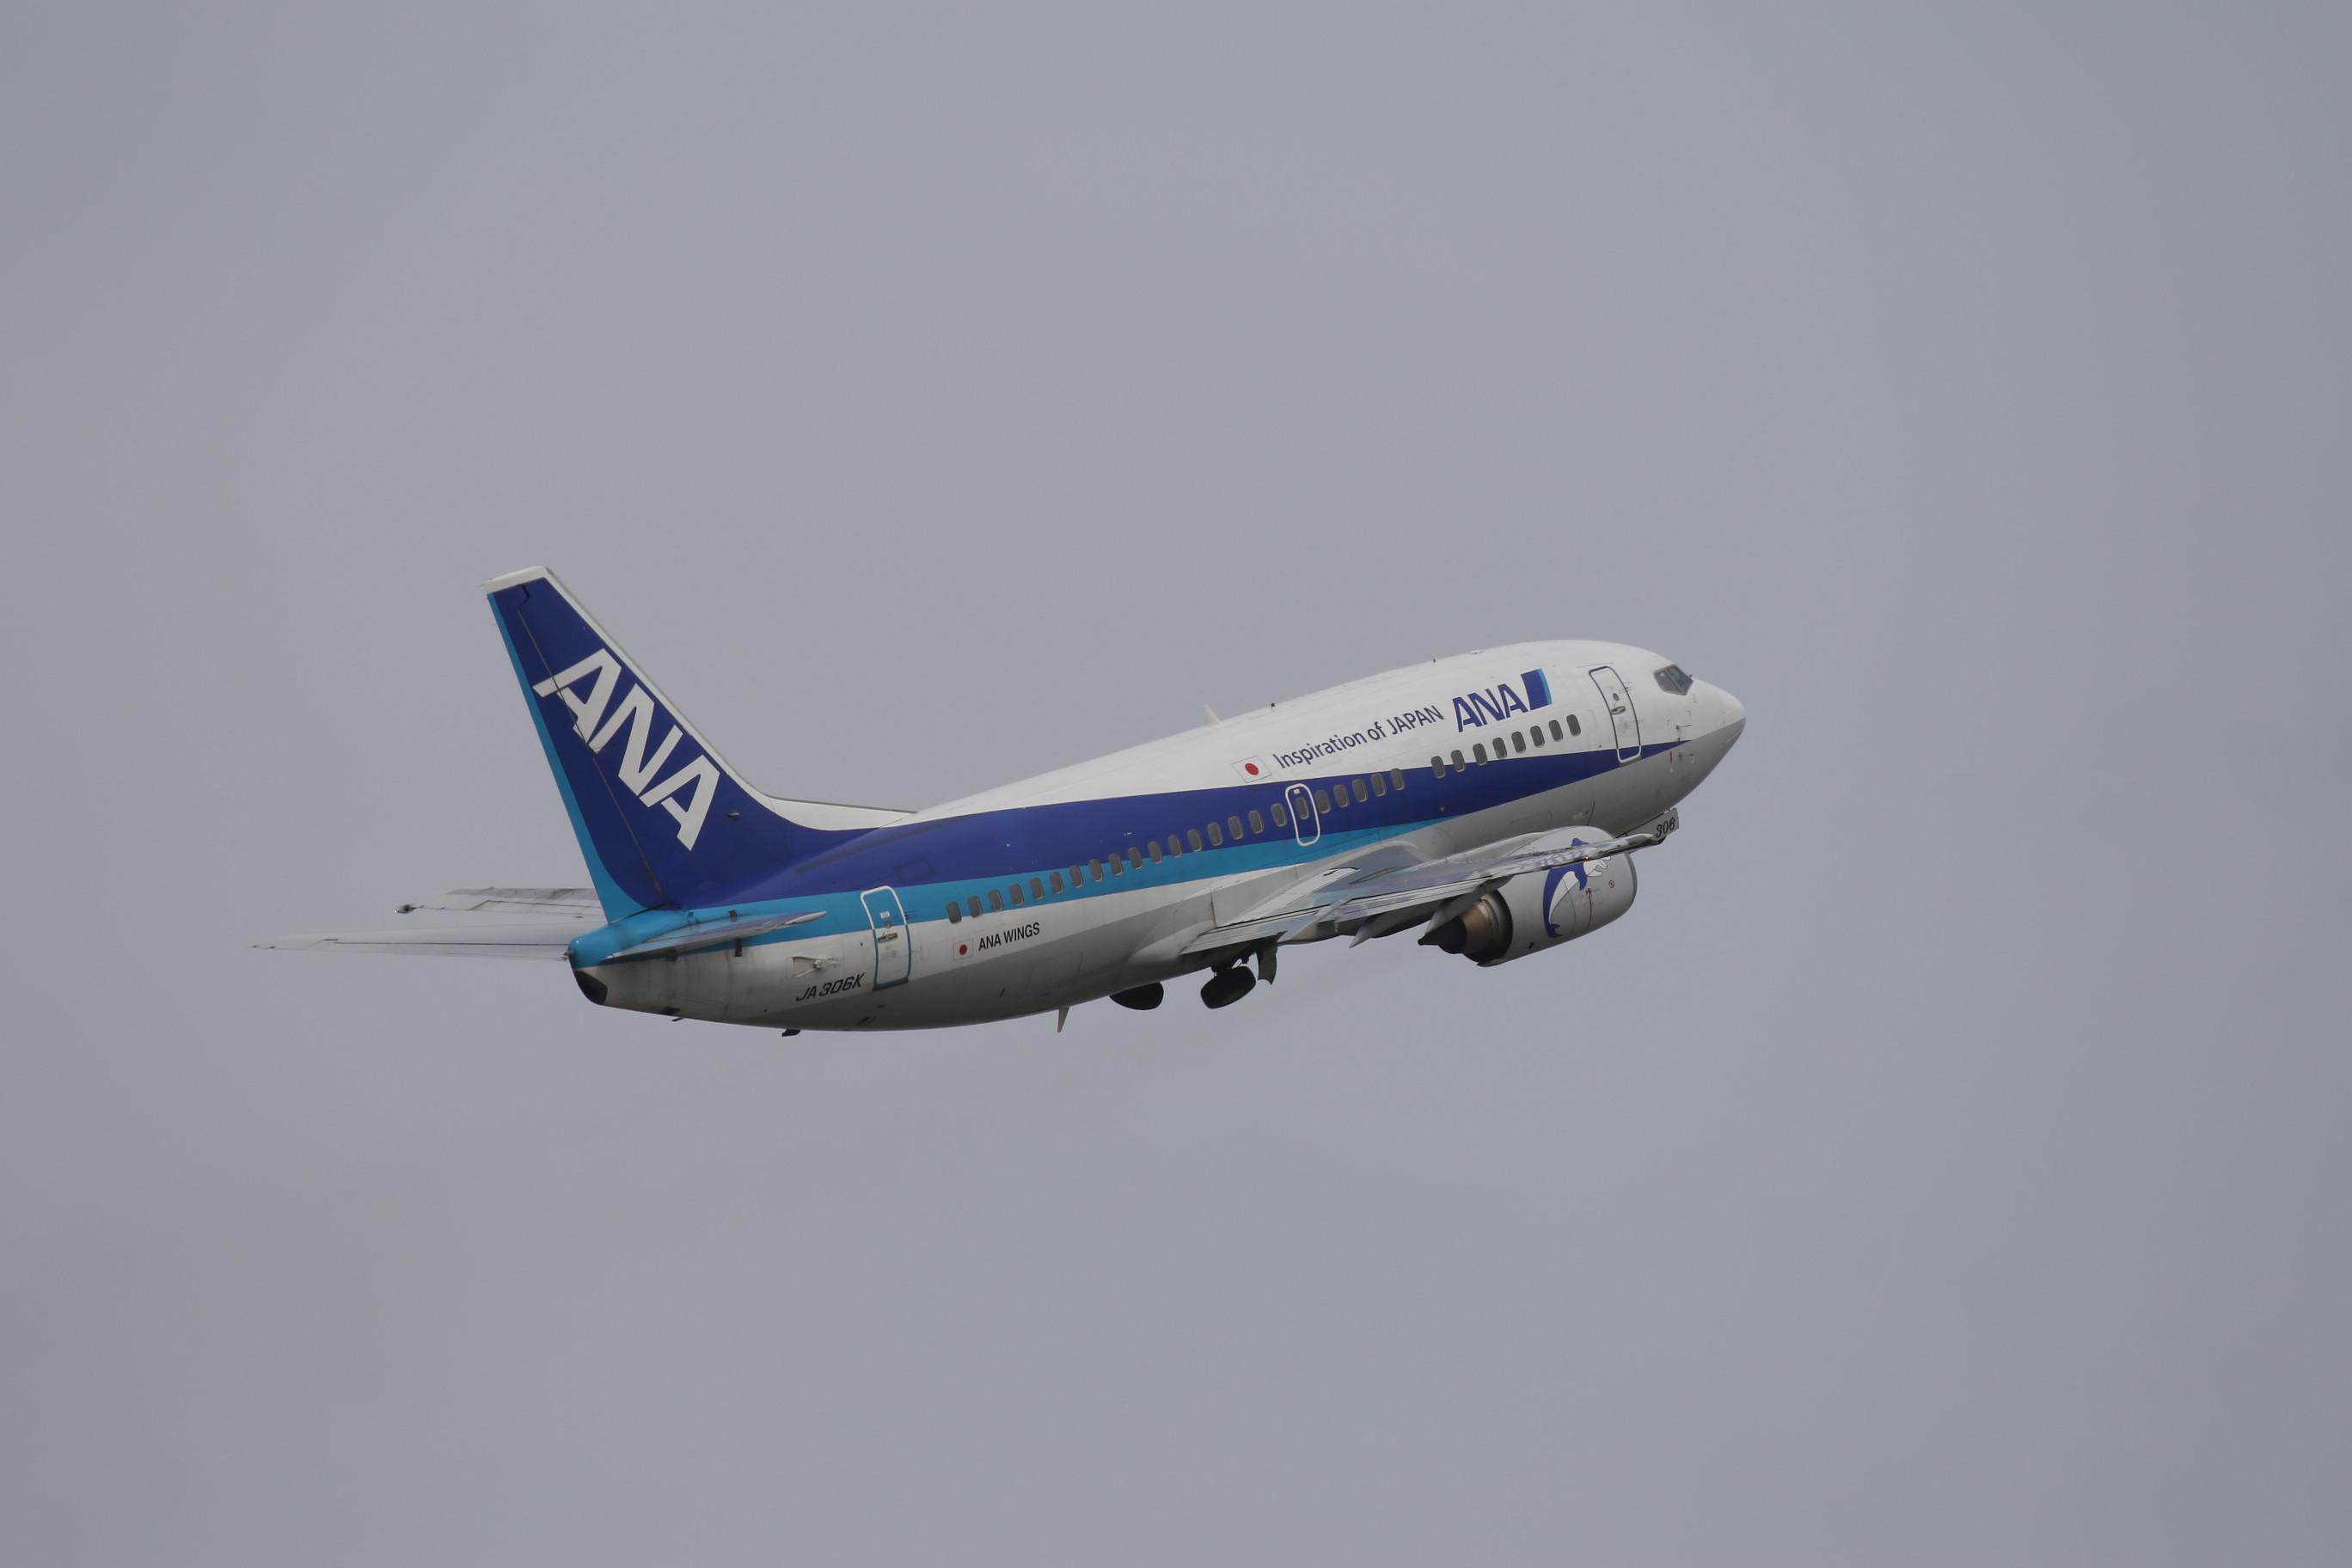 764A3521.jpg